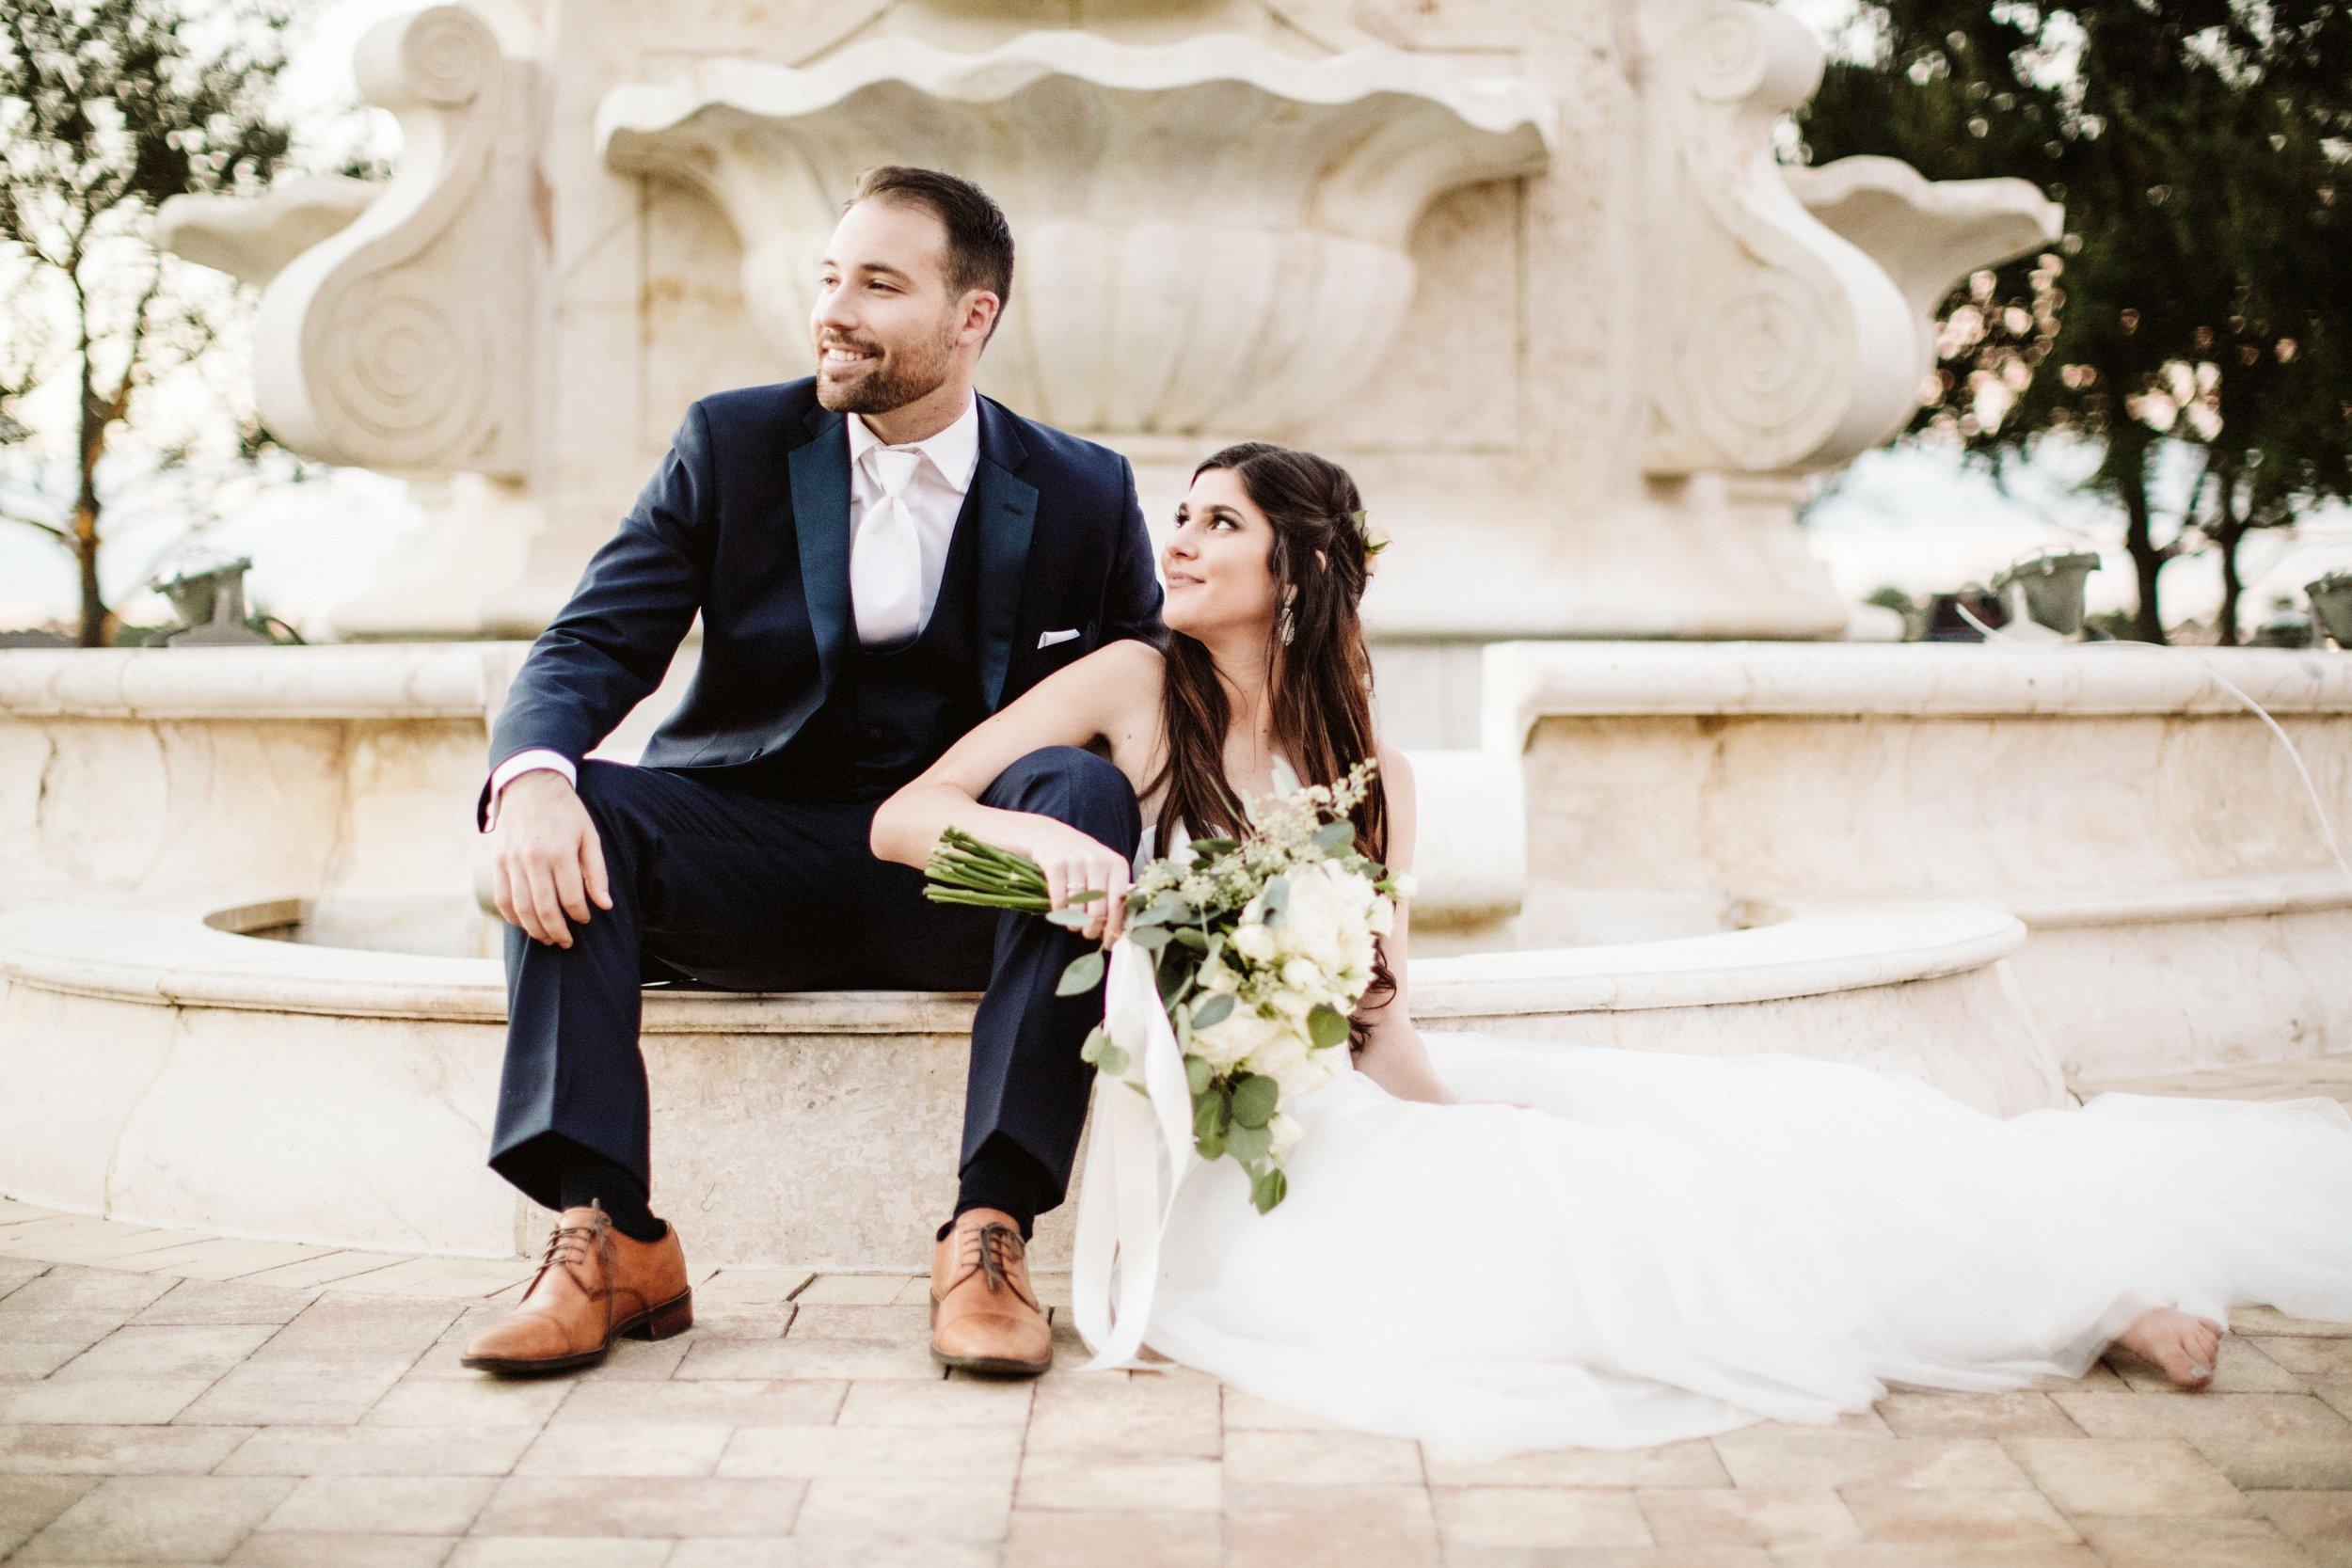 rachel-and-david-scott-wedding-720.jpg